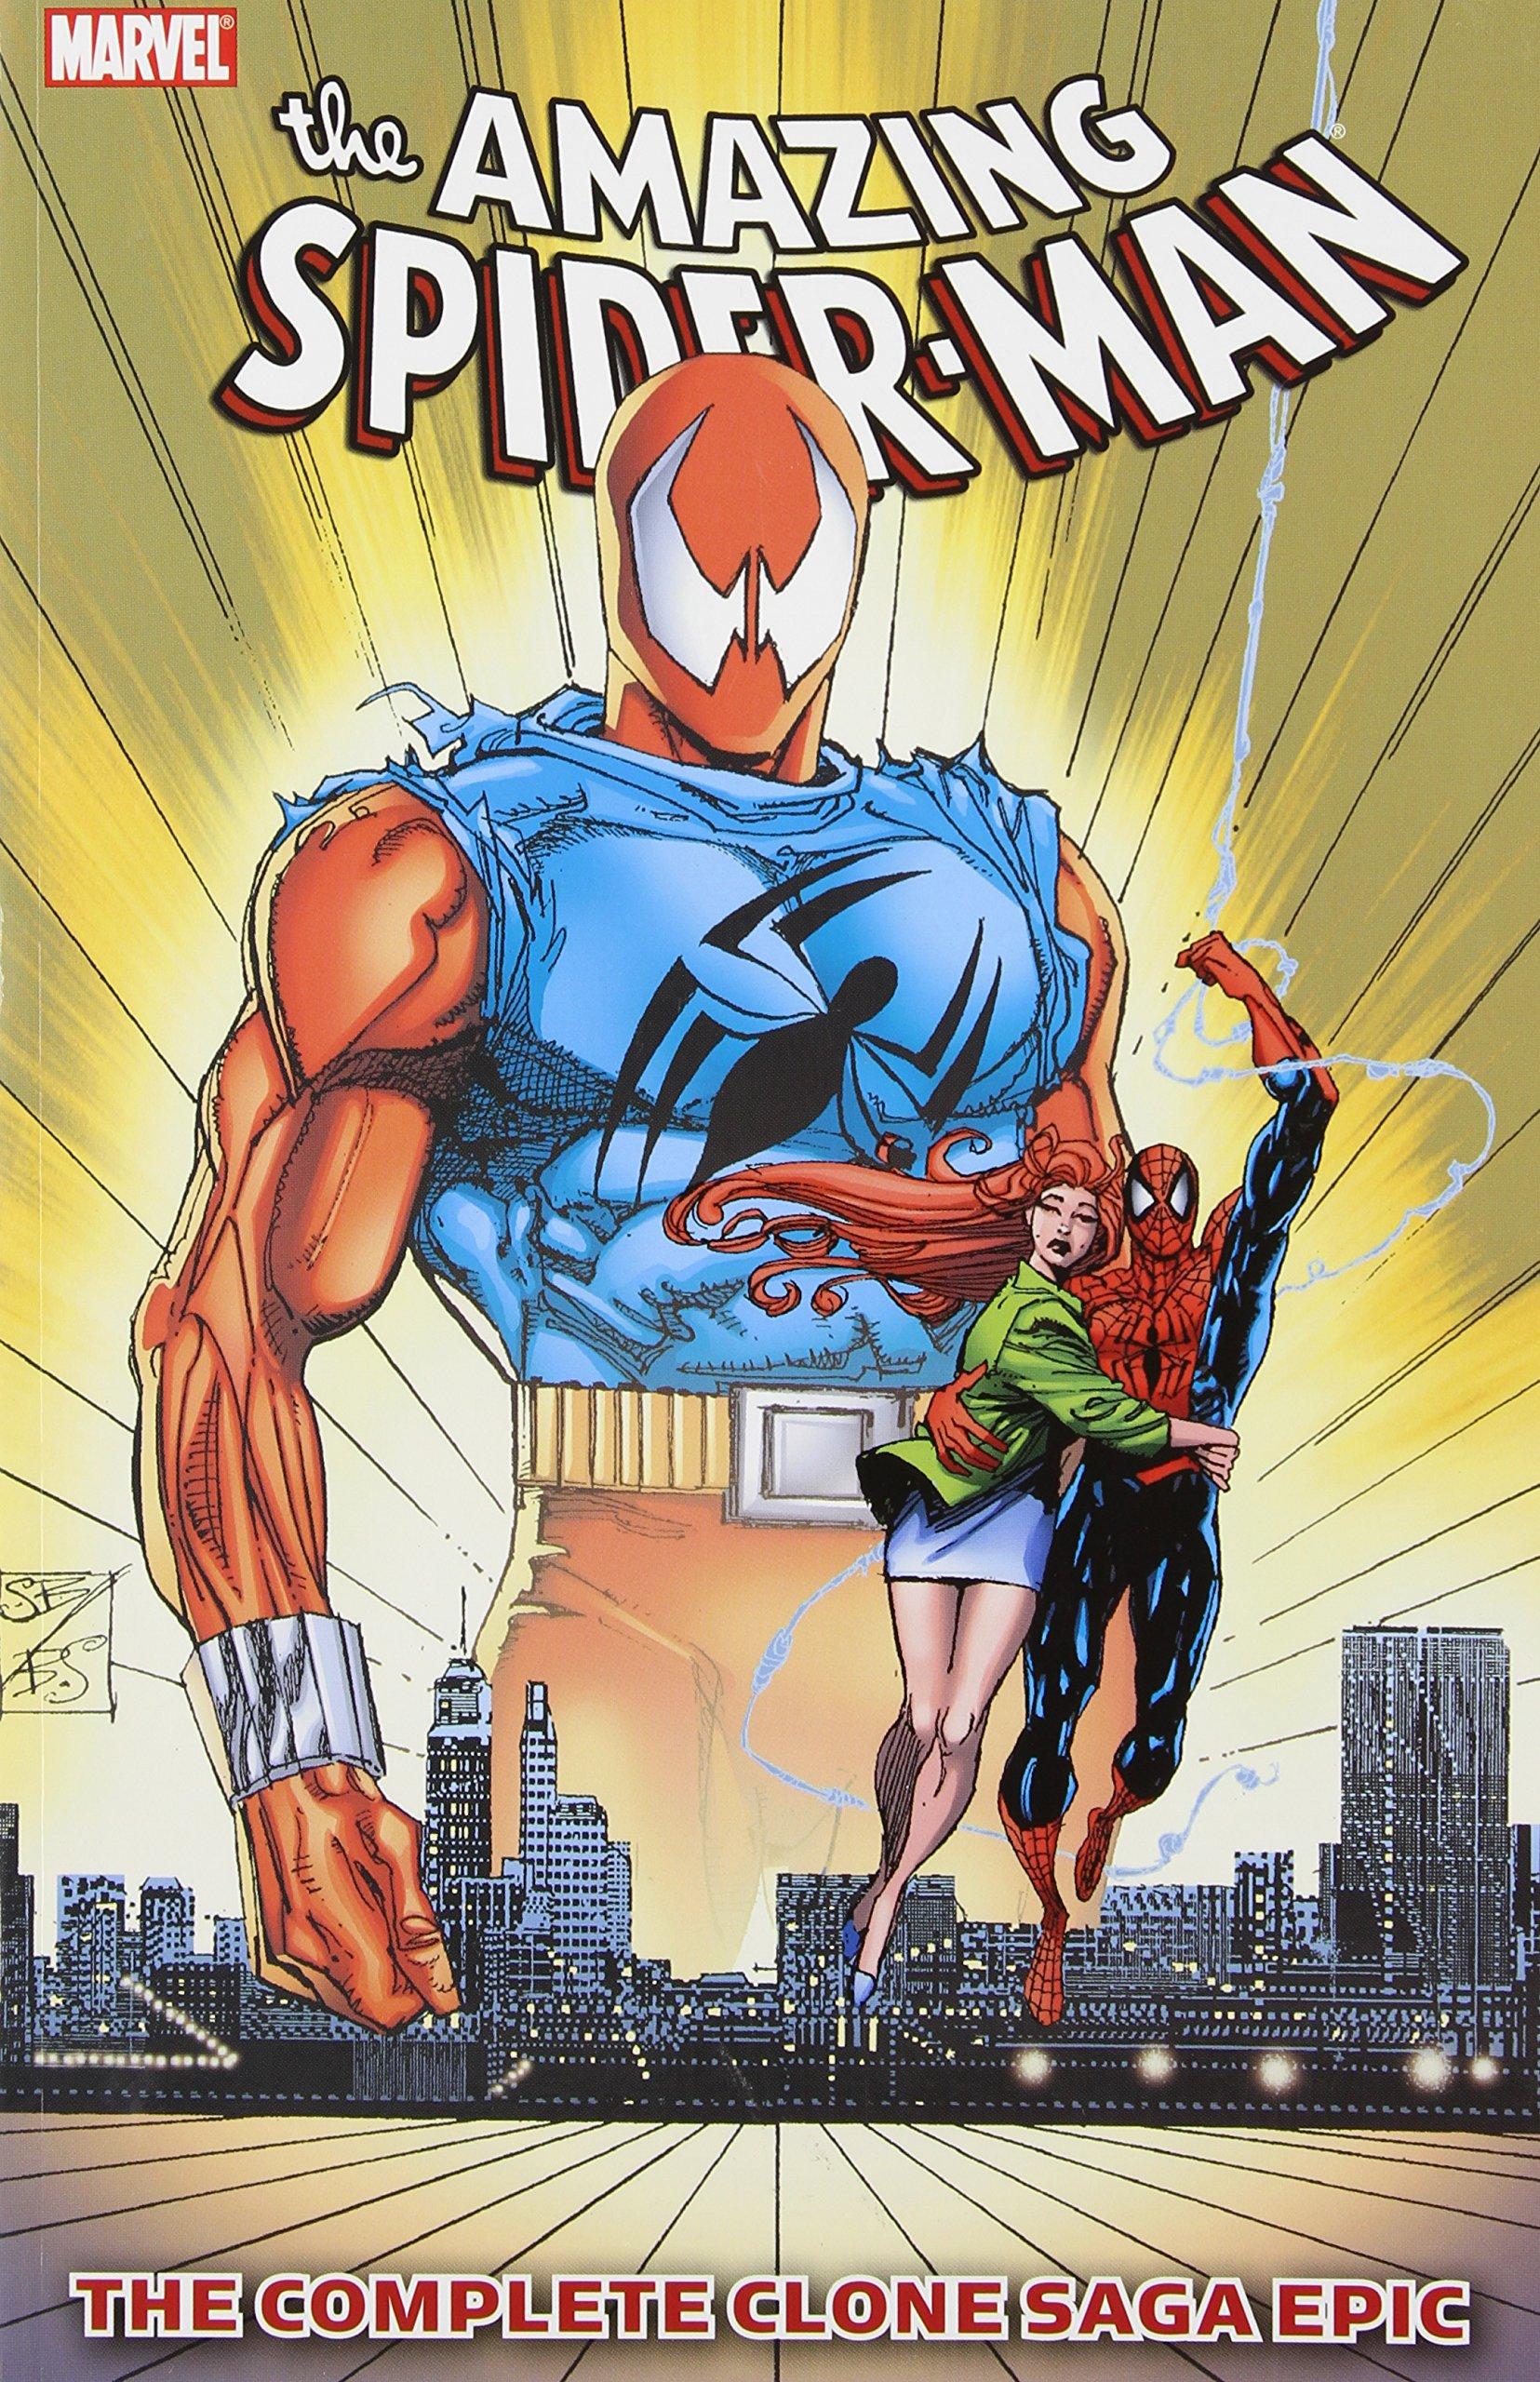 Spider-Man: The Complete Clone Saga Epic Vol 1 5